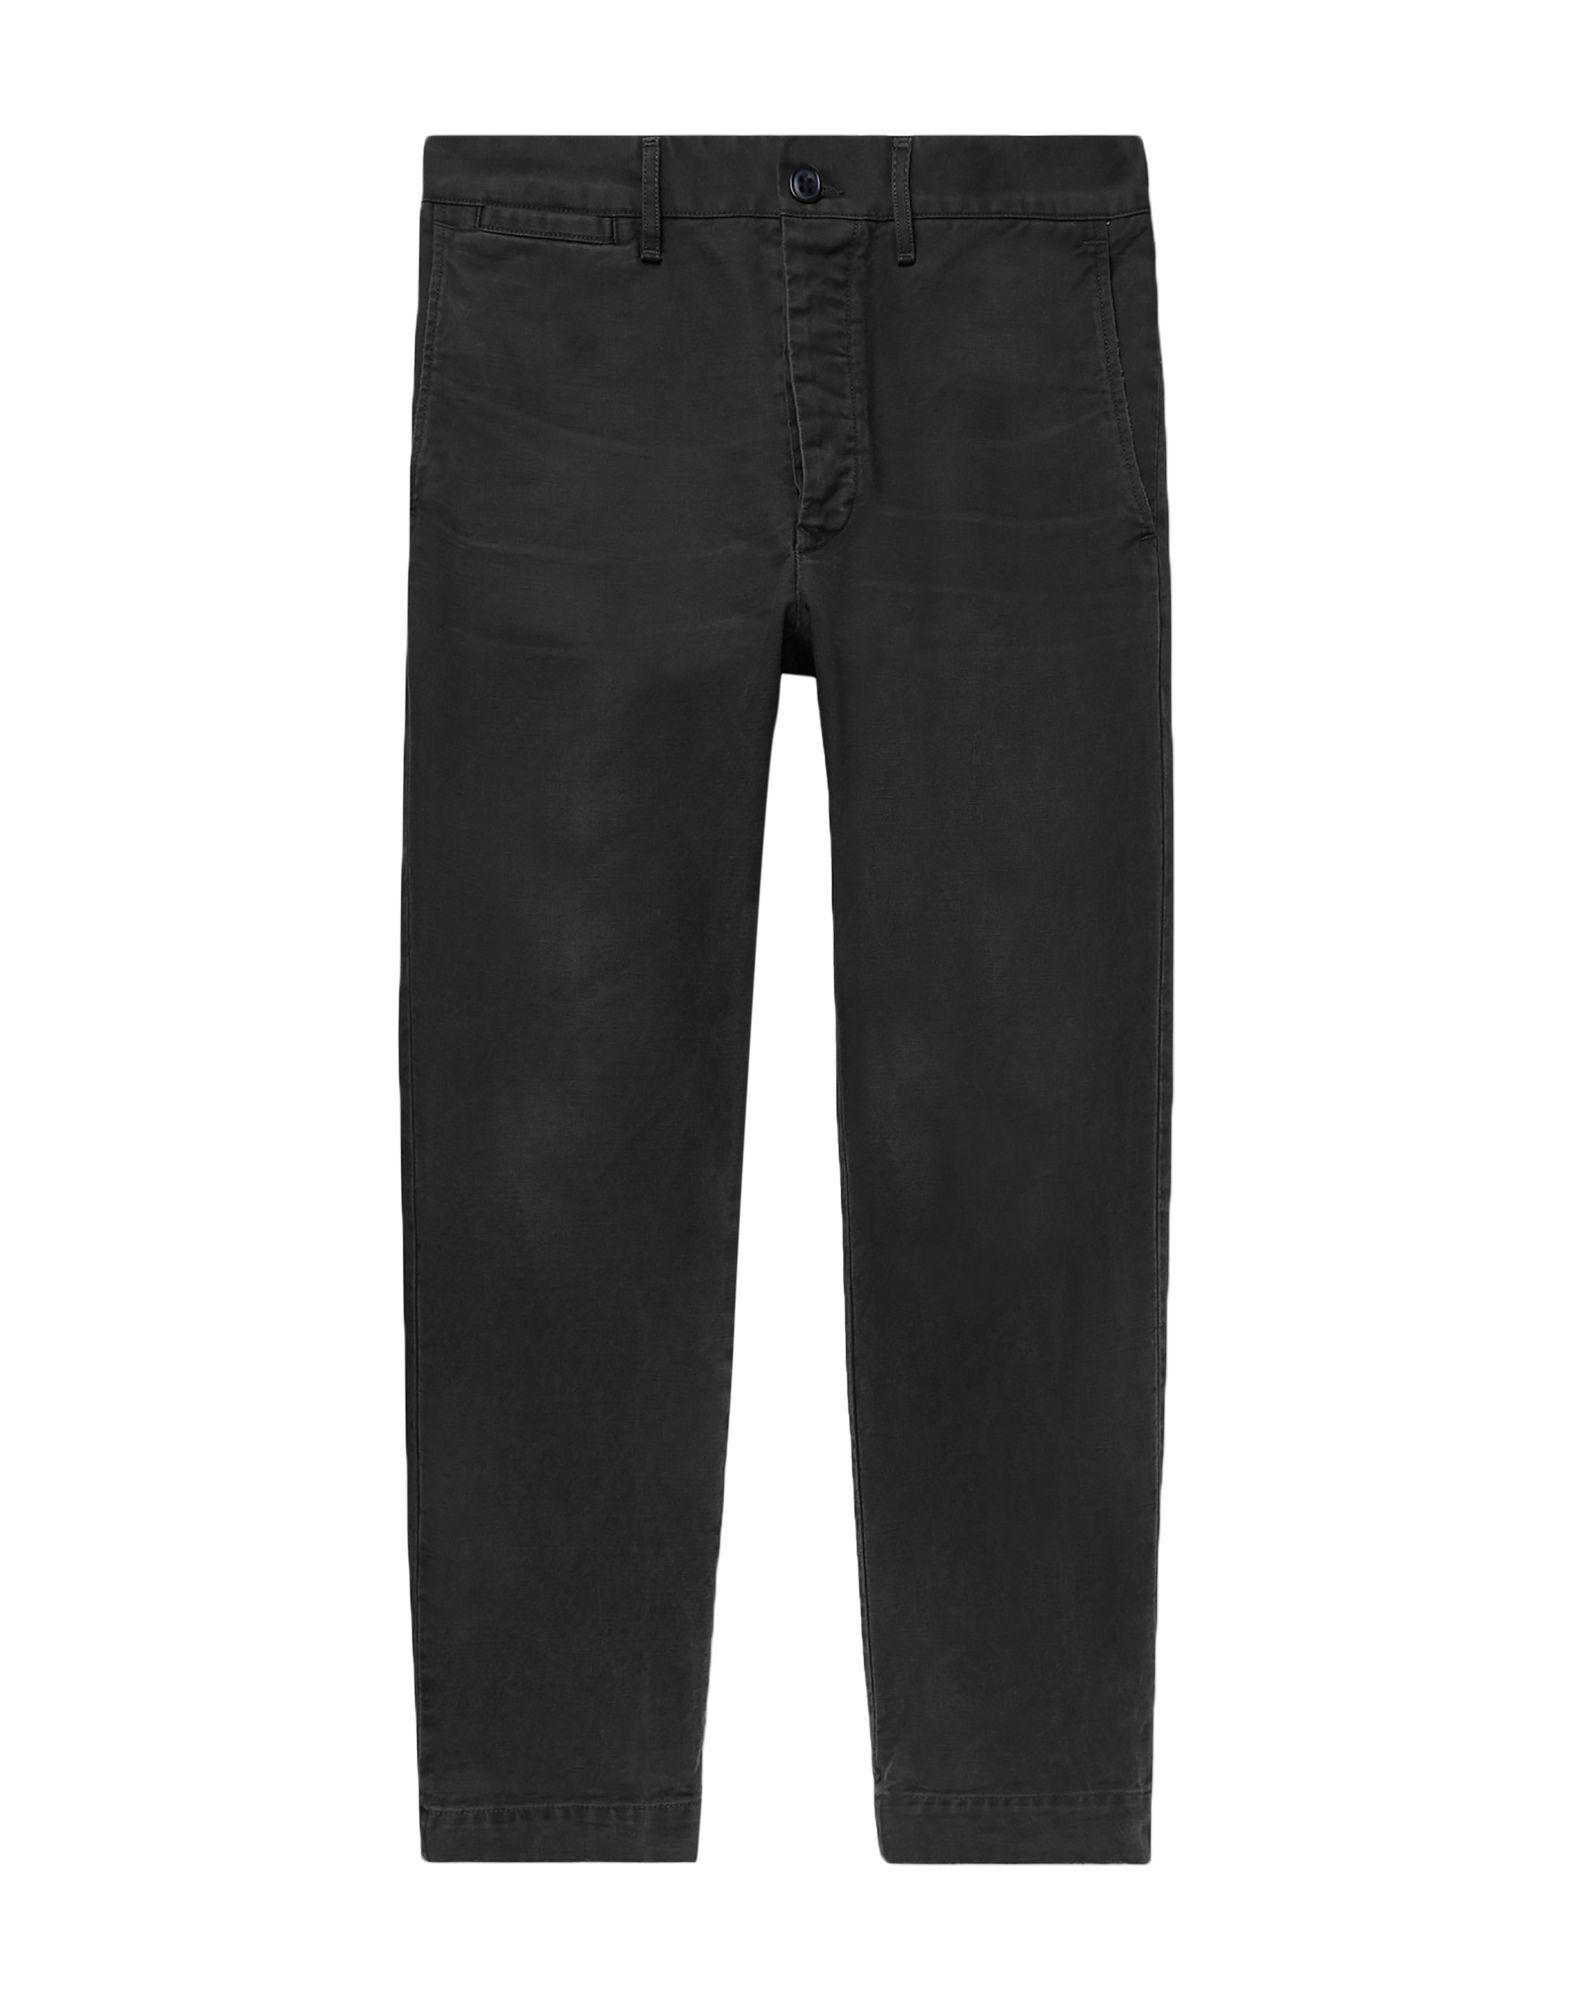 Фото - FABRIC-BRAND & CO. Повседневные брюки fabric brand